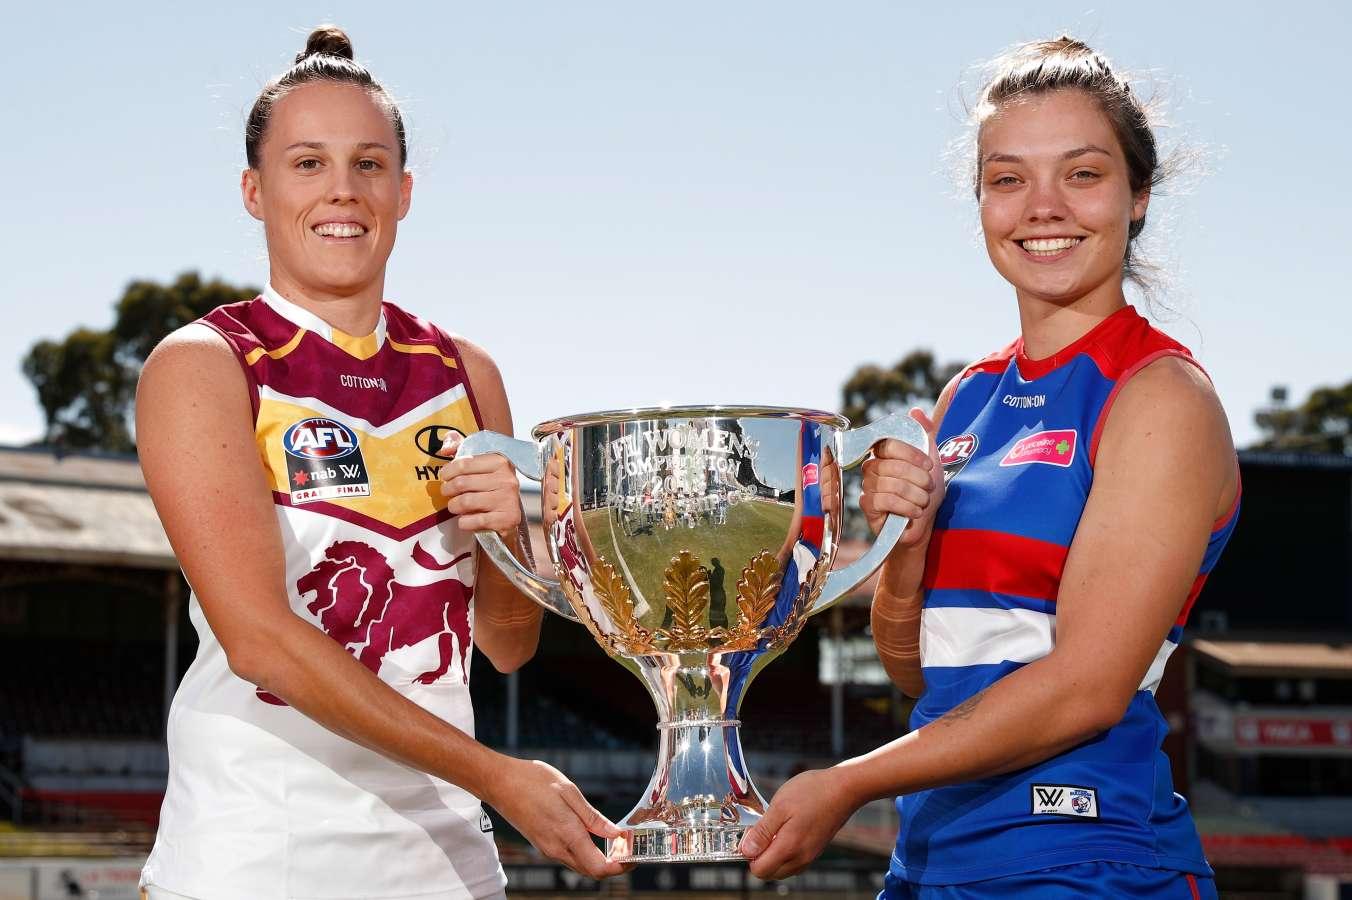 AFLW Grand Final: Western Bulldogs vs Brisbane